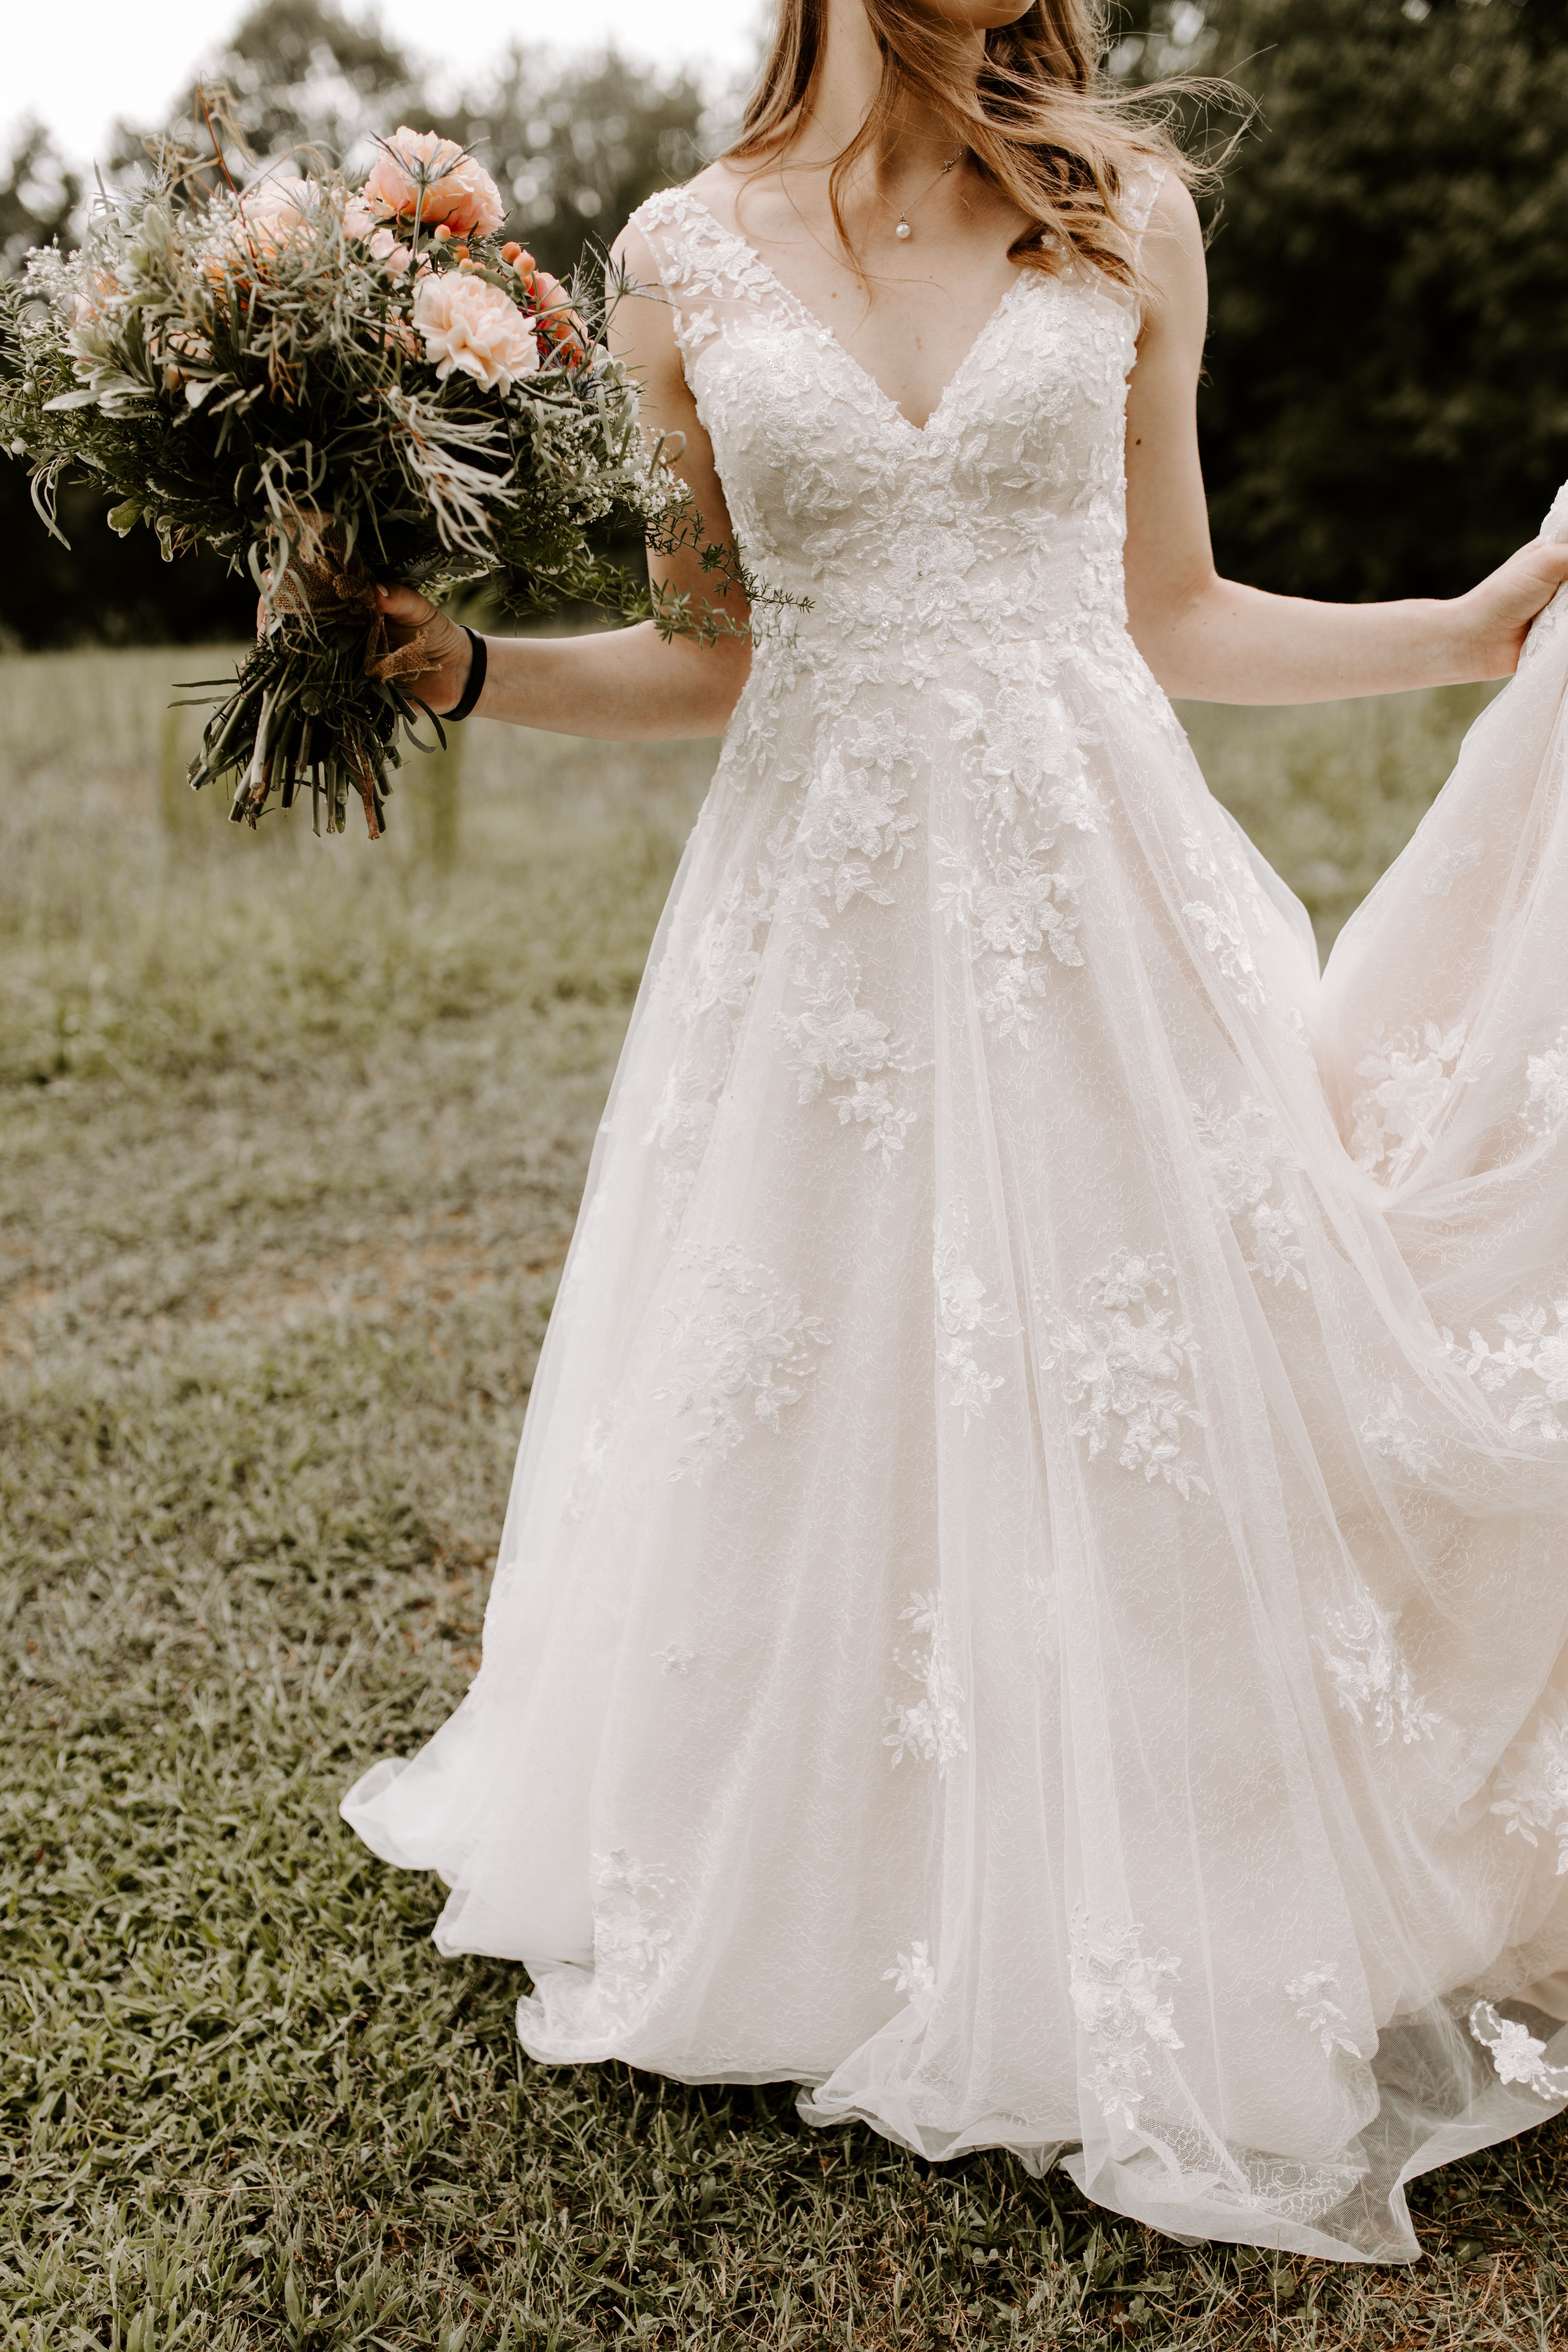 Boho Summer Wedding Sc Floral Wedding Dress Wedding Dress Inspiration Boho Wedding Dress [ 6463 x 4309 Pixel ]